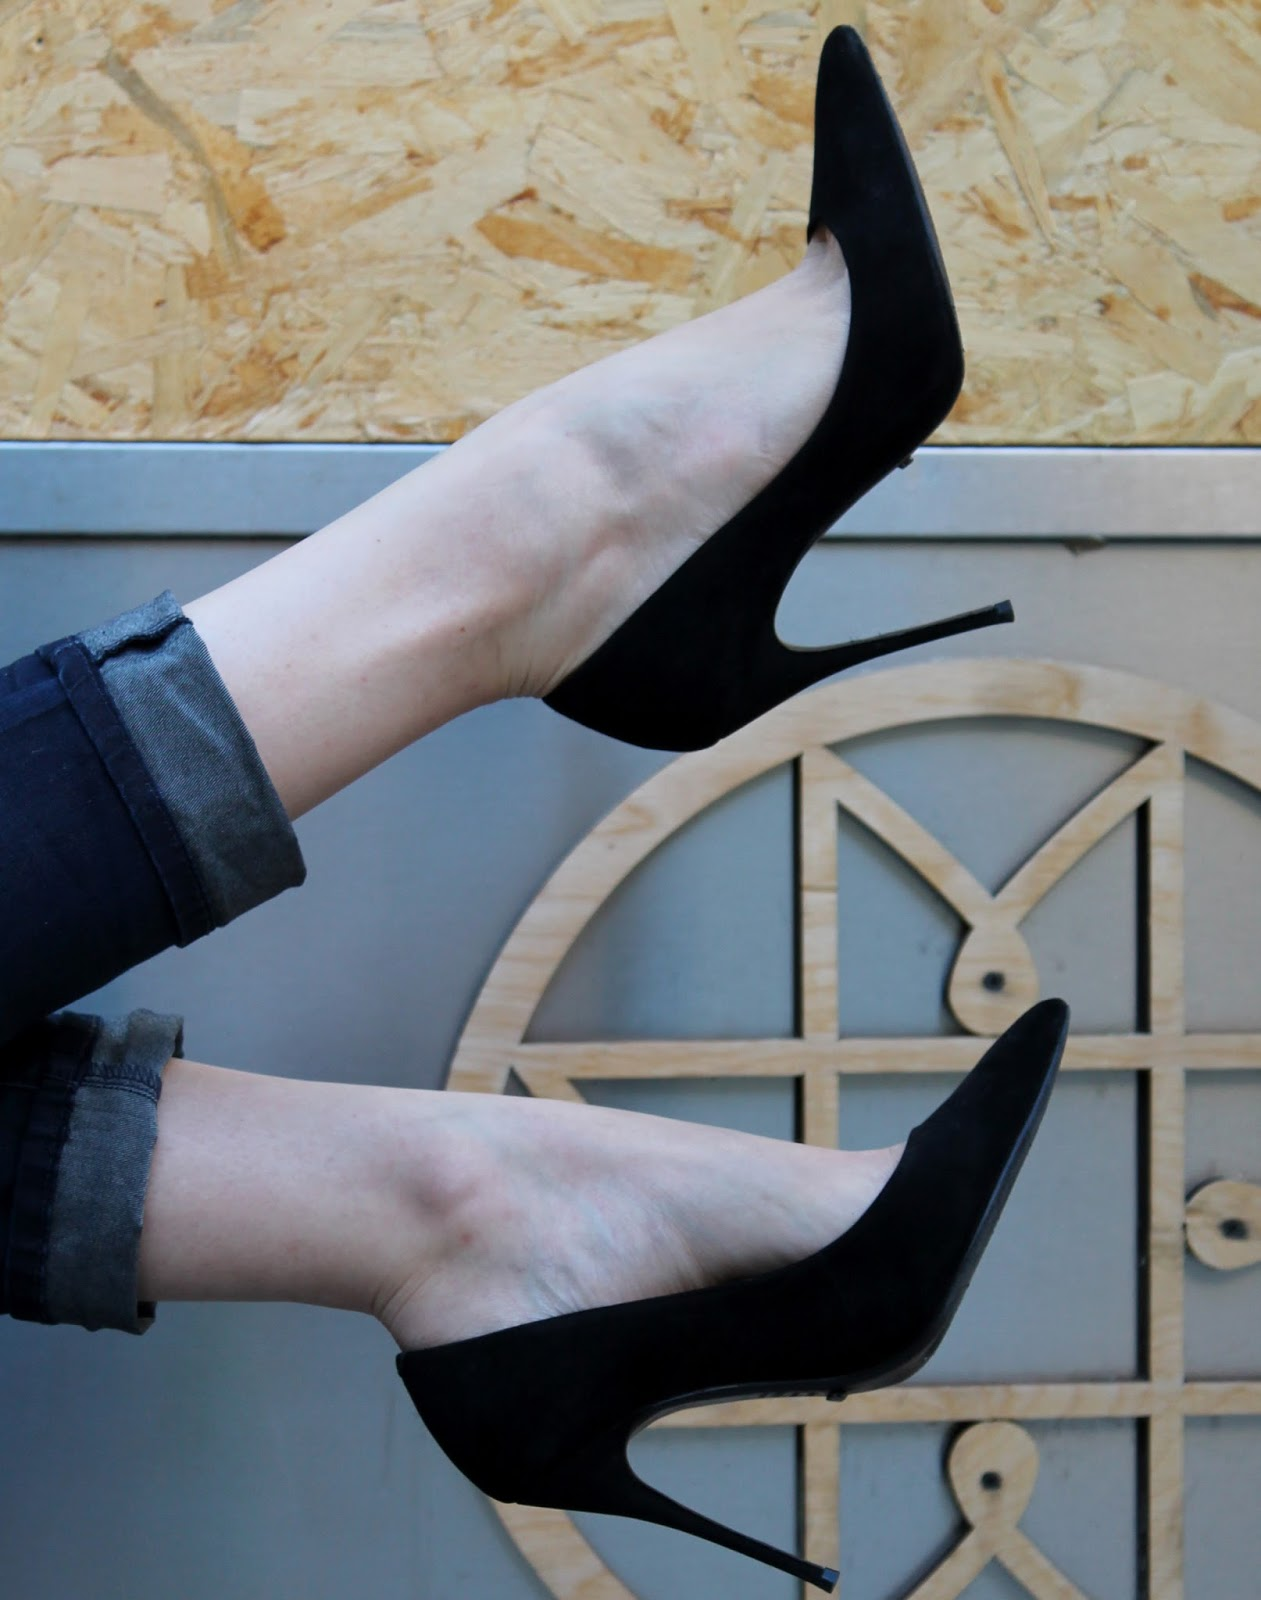 Advise you Teens wearing high heels